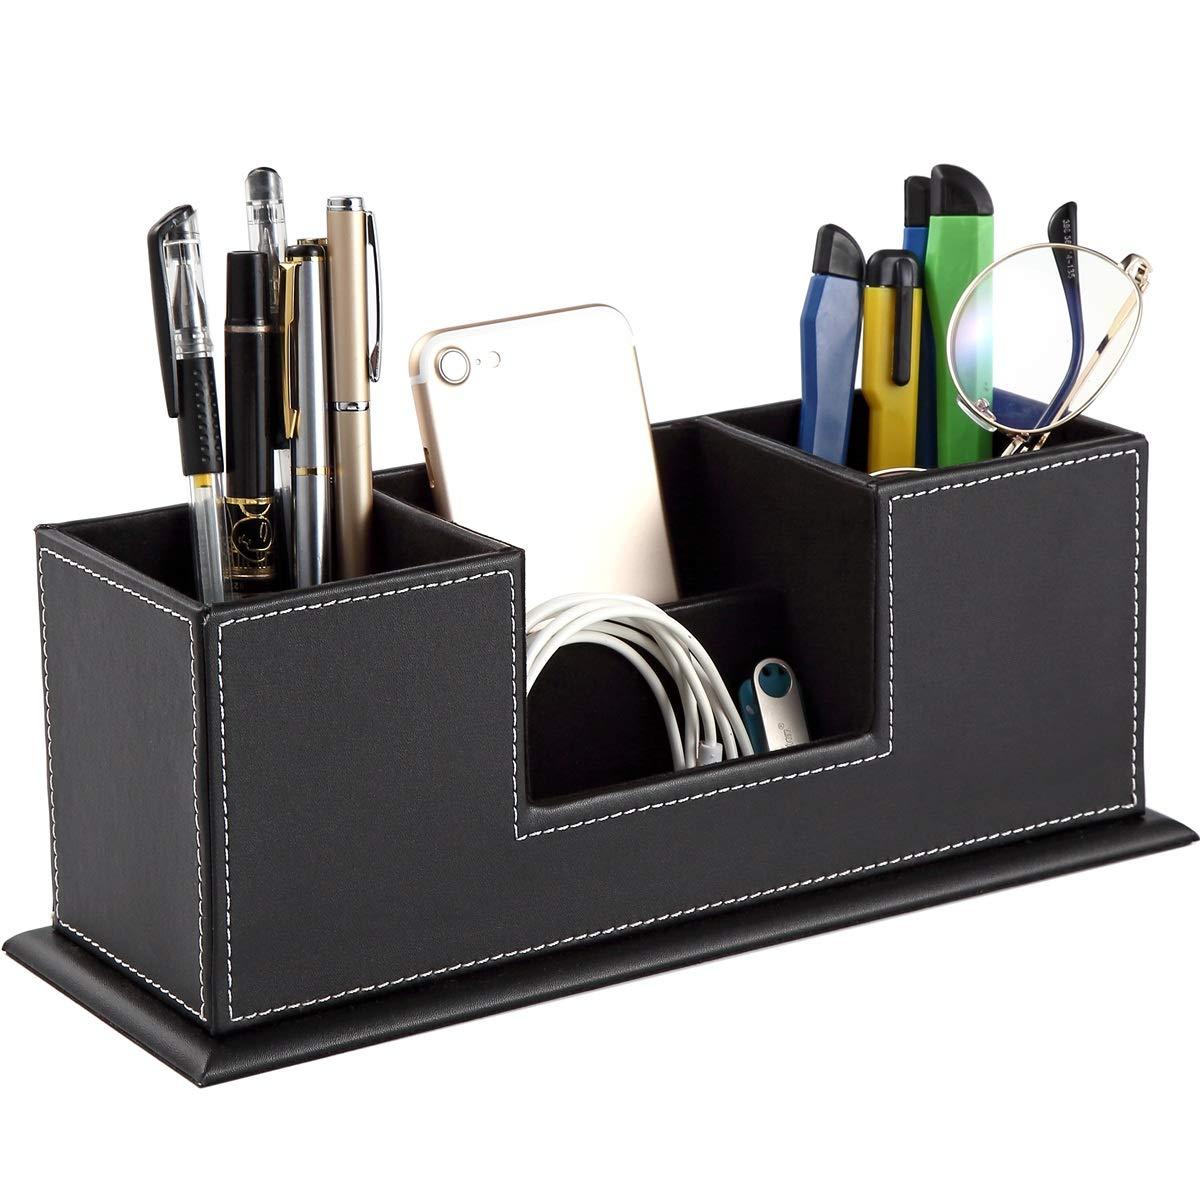 URbantin Organizer Office Desk Pen holder for Desk Tidy + 4 Spacious Compartments, Remote Control Holder Organizer Caddy, PU Leather Media Desktop Organizer (Pen Holder Clipboard for Free) (Black)